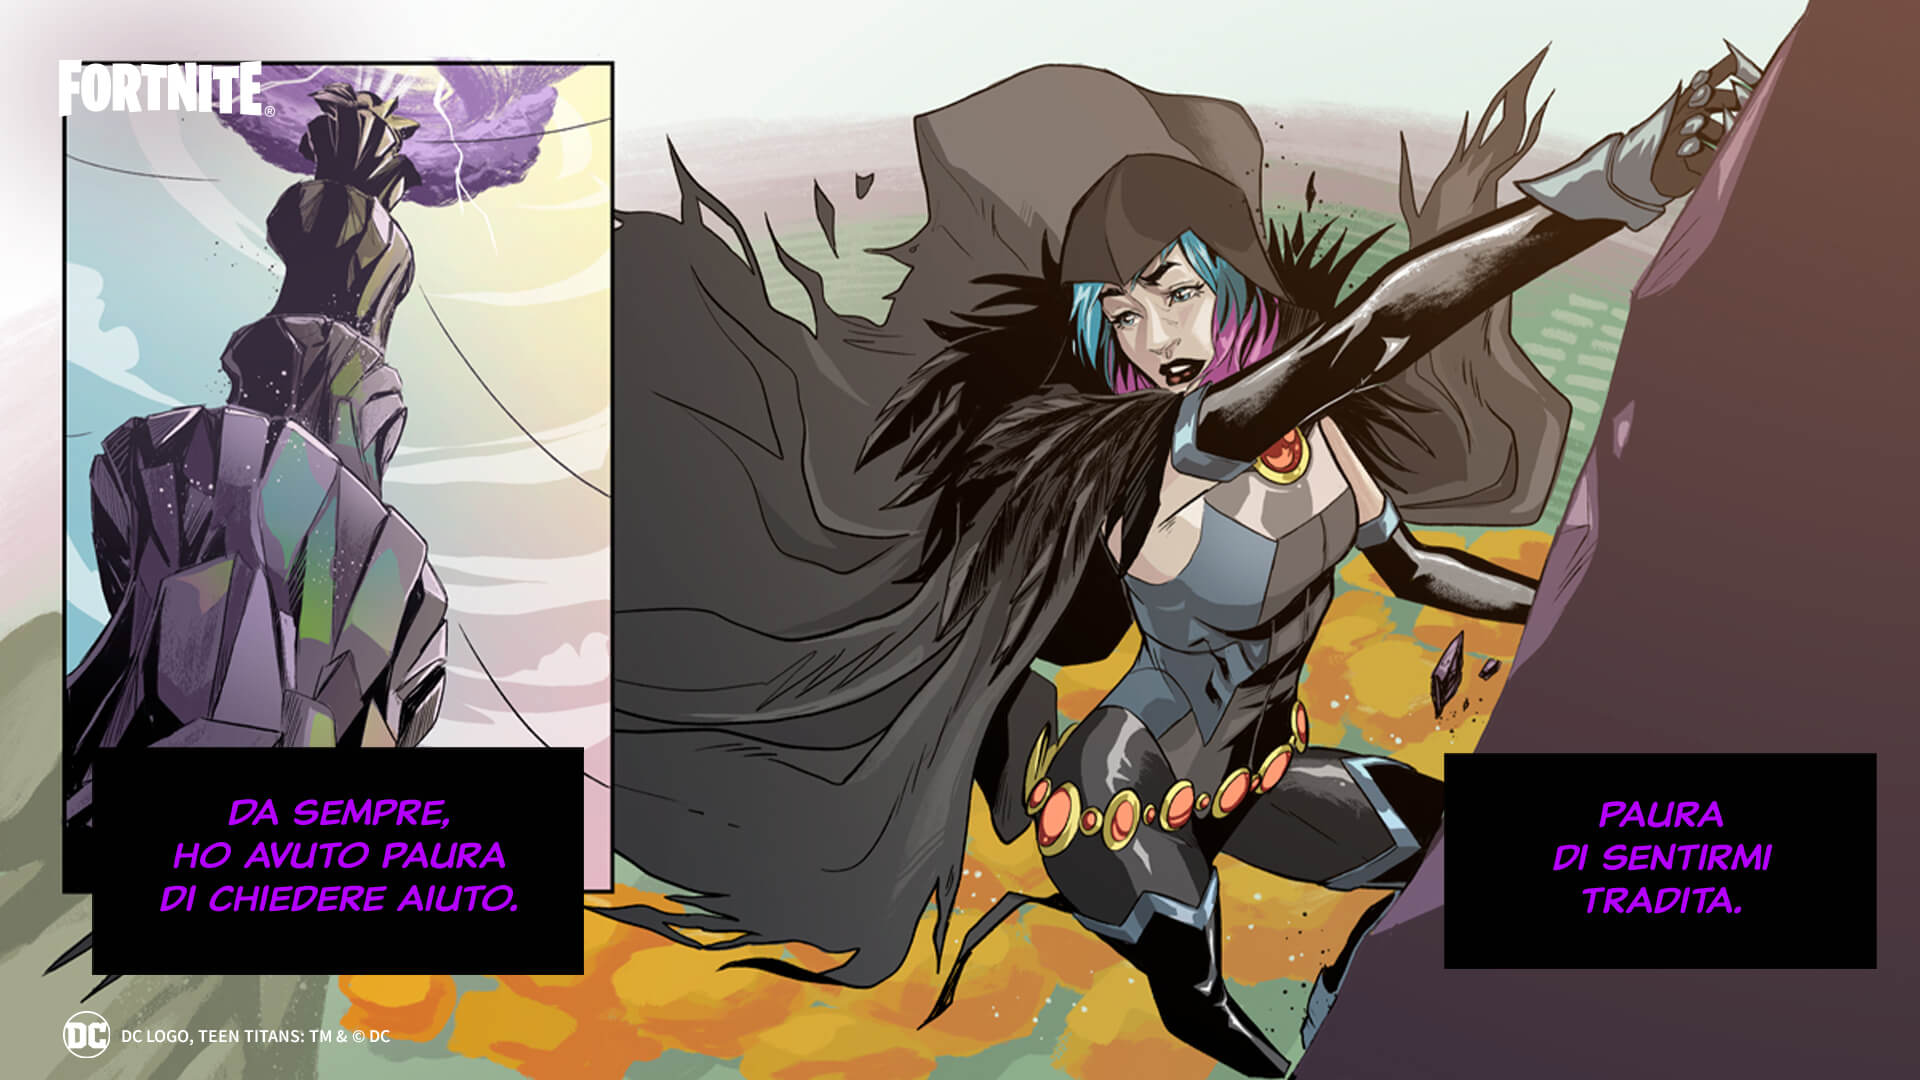 IT Raven BeastBoy S16 01 Social 1920x1080 1